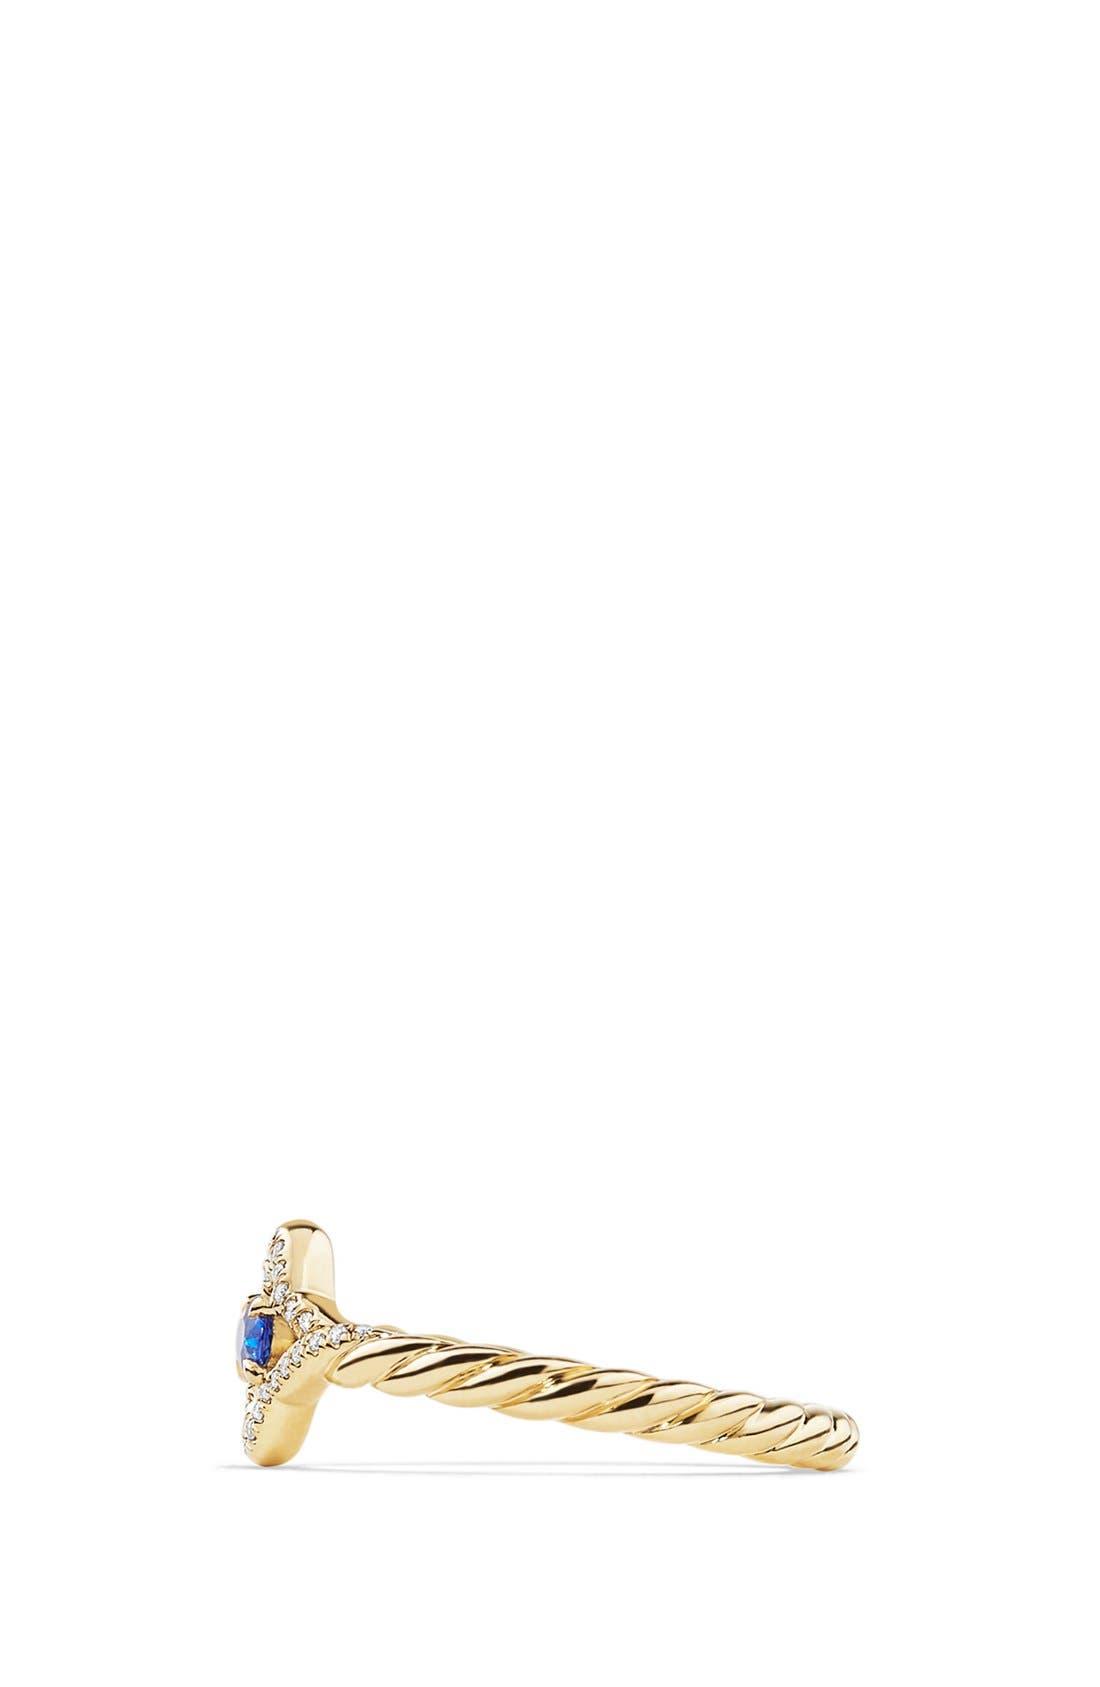 'Venetial Quatrefoil' Ring in Gold,                             Alternate thumbnail 2, color,                             BLUE SAPPHIRE